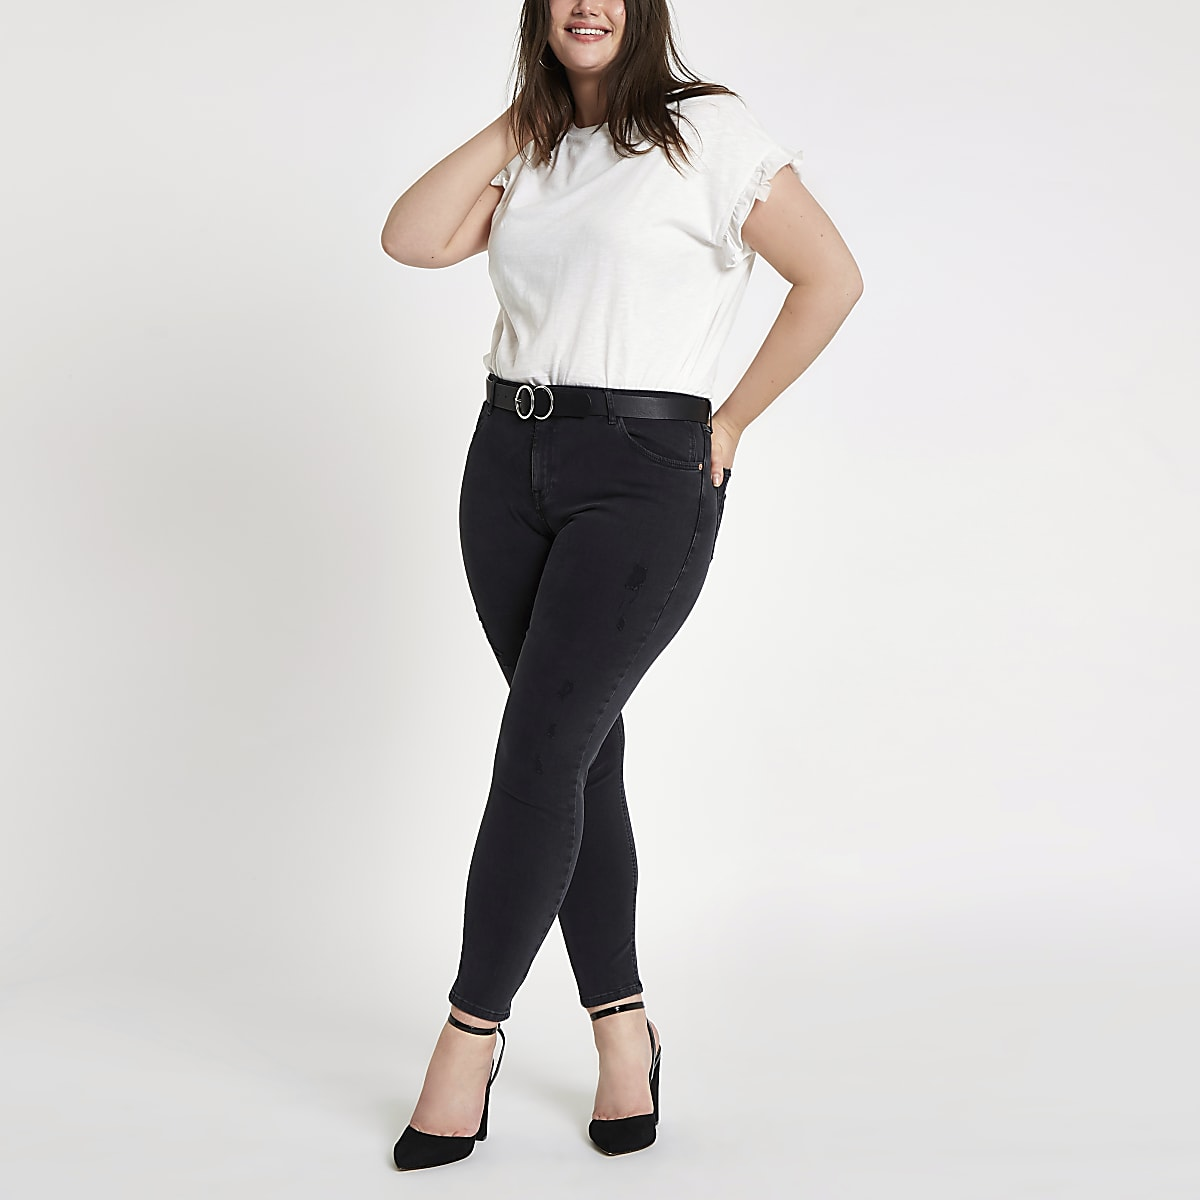 b3d66d4998b6 Plus black wash Alannah mid rise skinny jeans - Straight & Slim Jeans -  Jeans - women